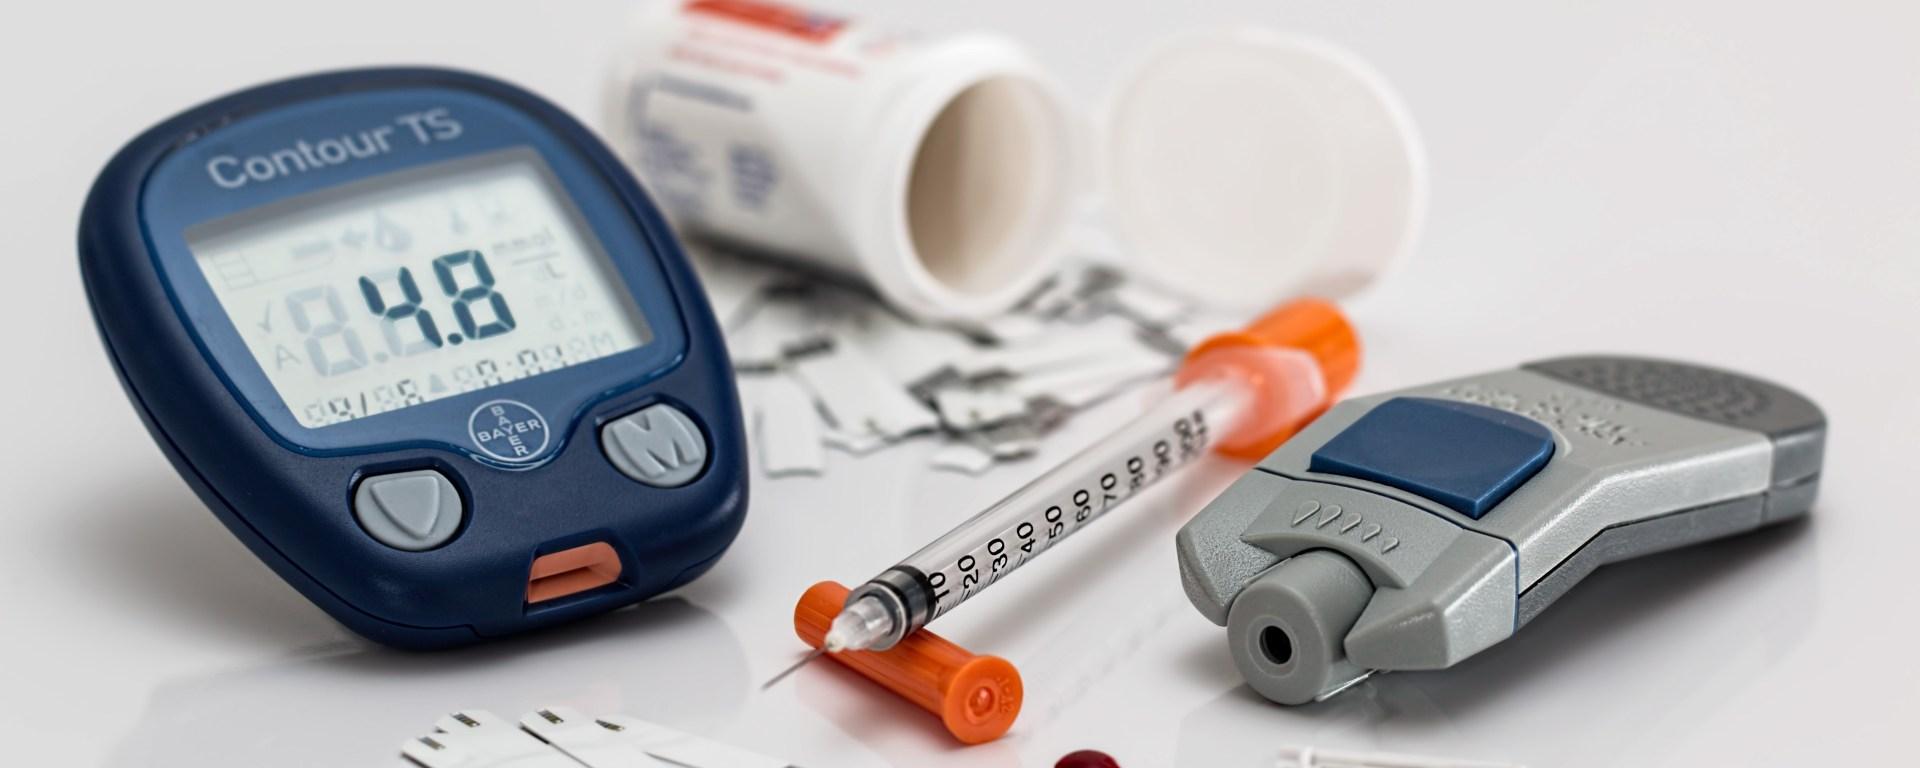 Diabetes medical supplies.